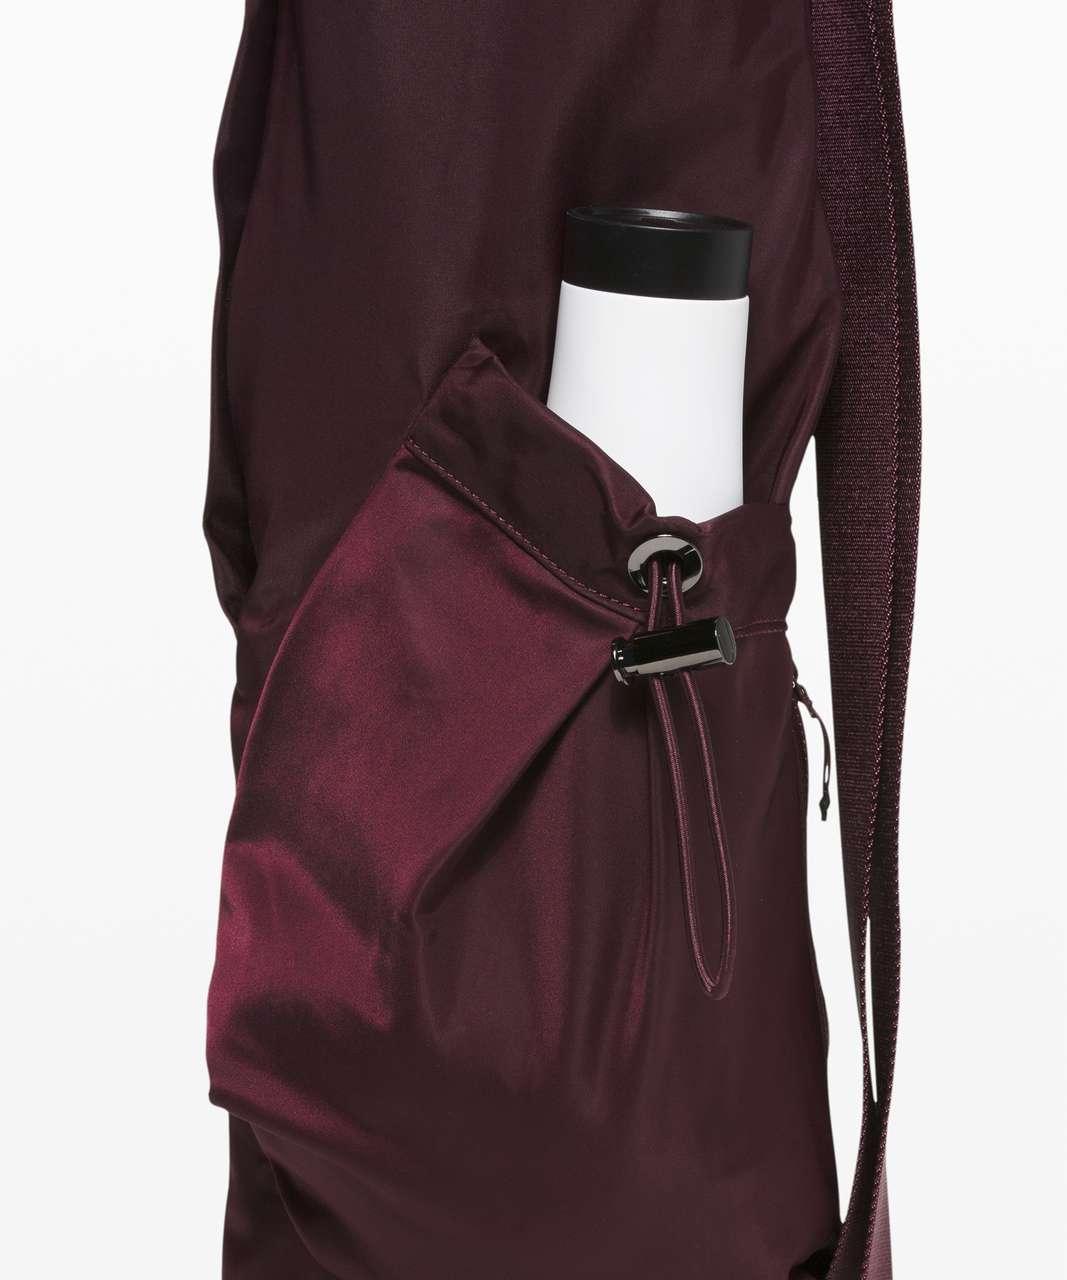 Lululemon The Yoga Mat Bag *16L - Cassis